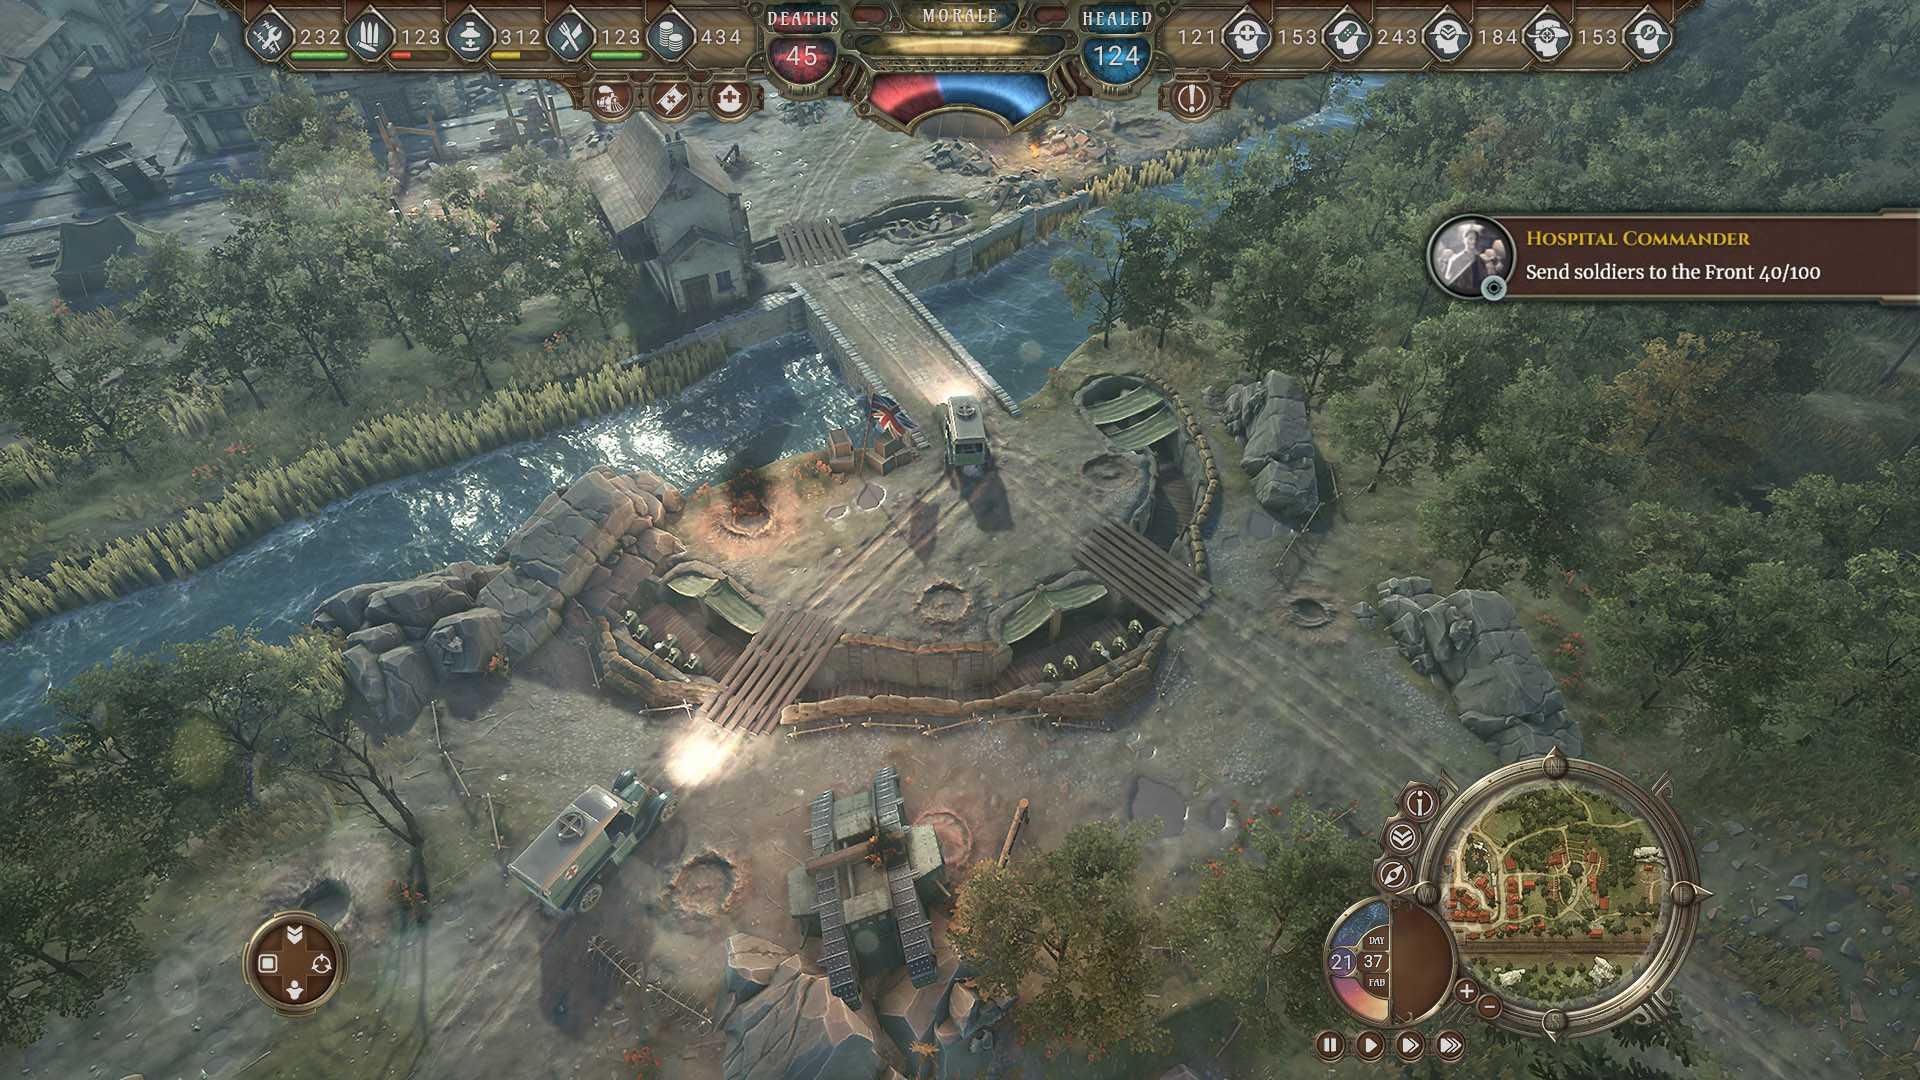 War Hospital - Screenshot 1920x1080